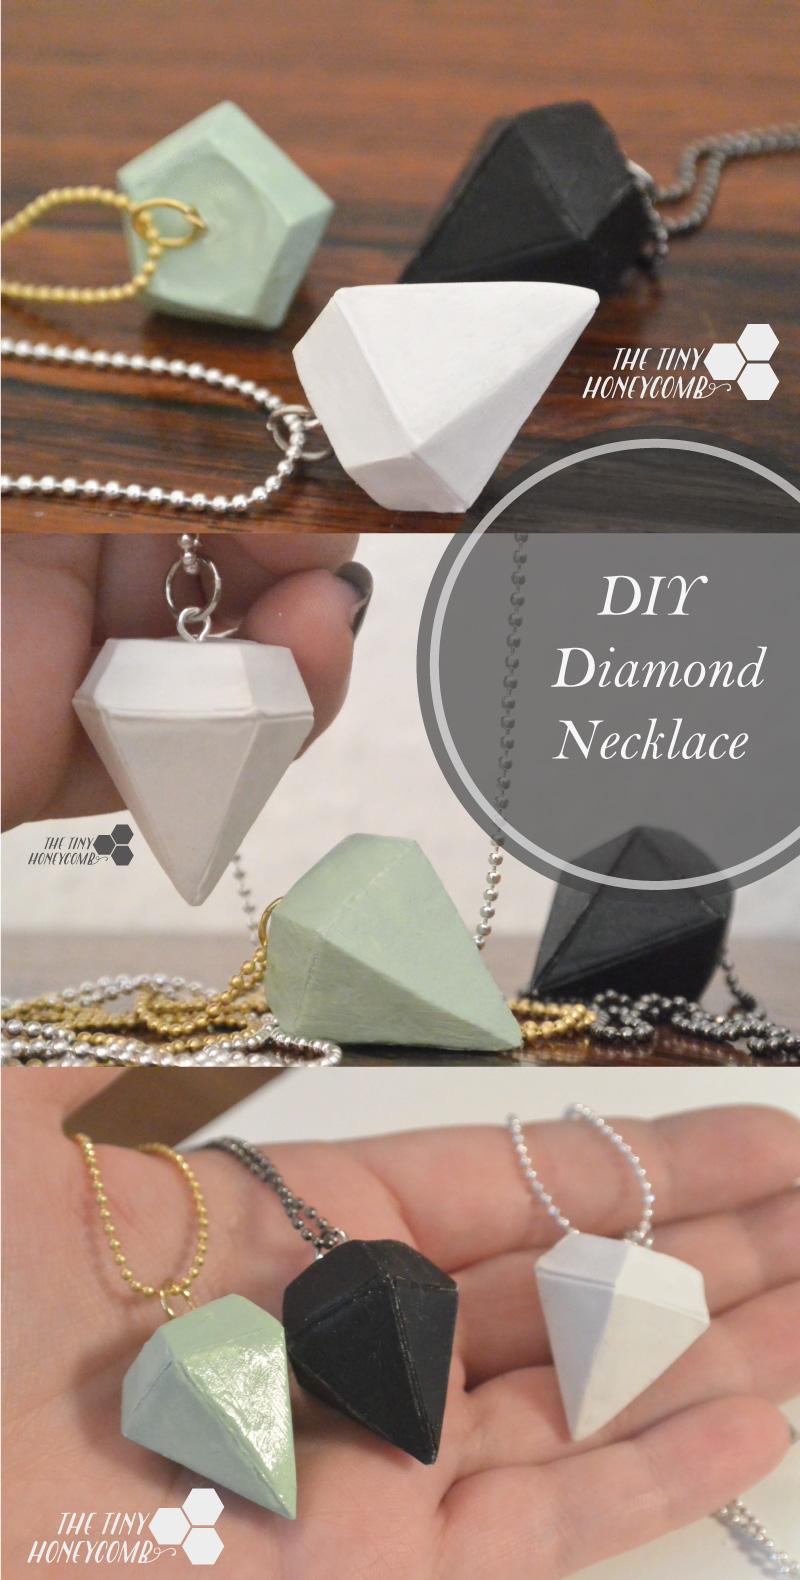 DIY diamond necklace tutorial. How to make a diamond pendant. the tiny honeycomb